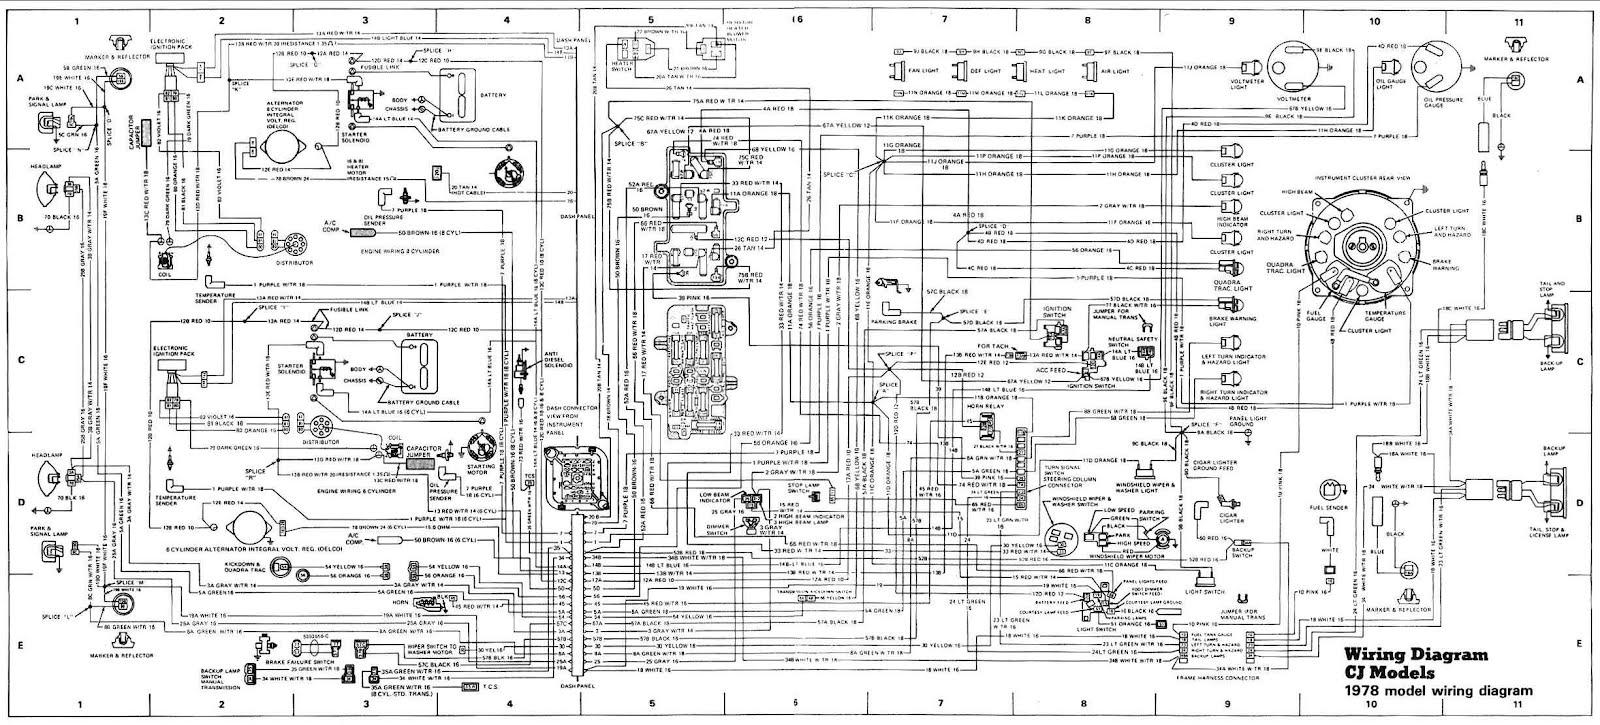 Beautiful Bmw Wiring Diagram Gallery - Electrical Diagram Ideas ...